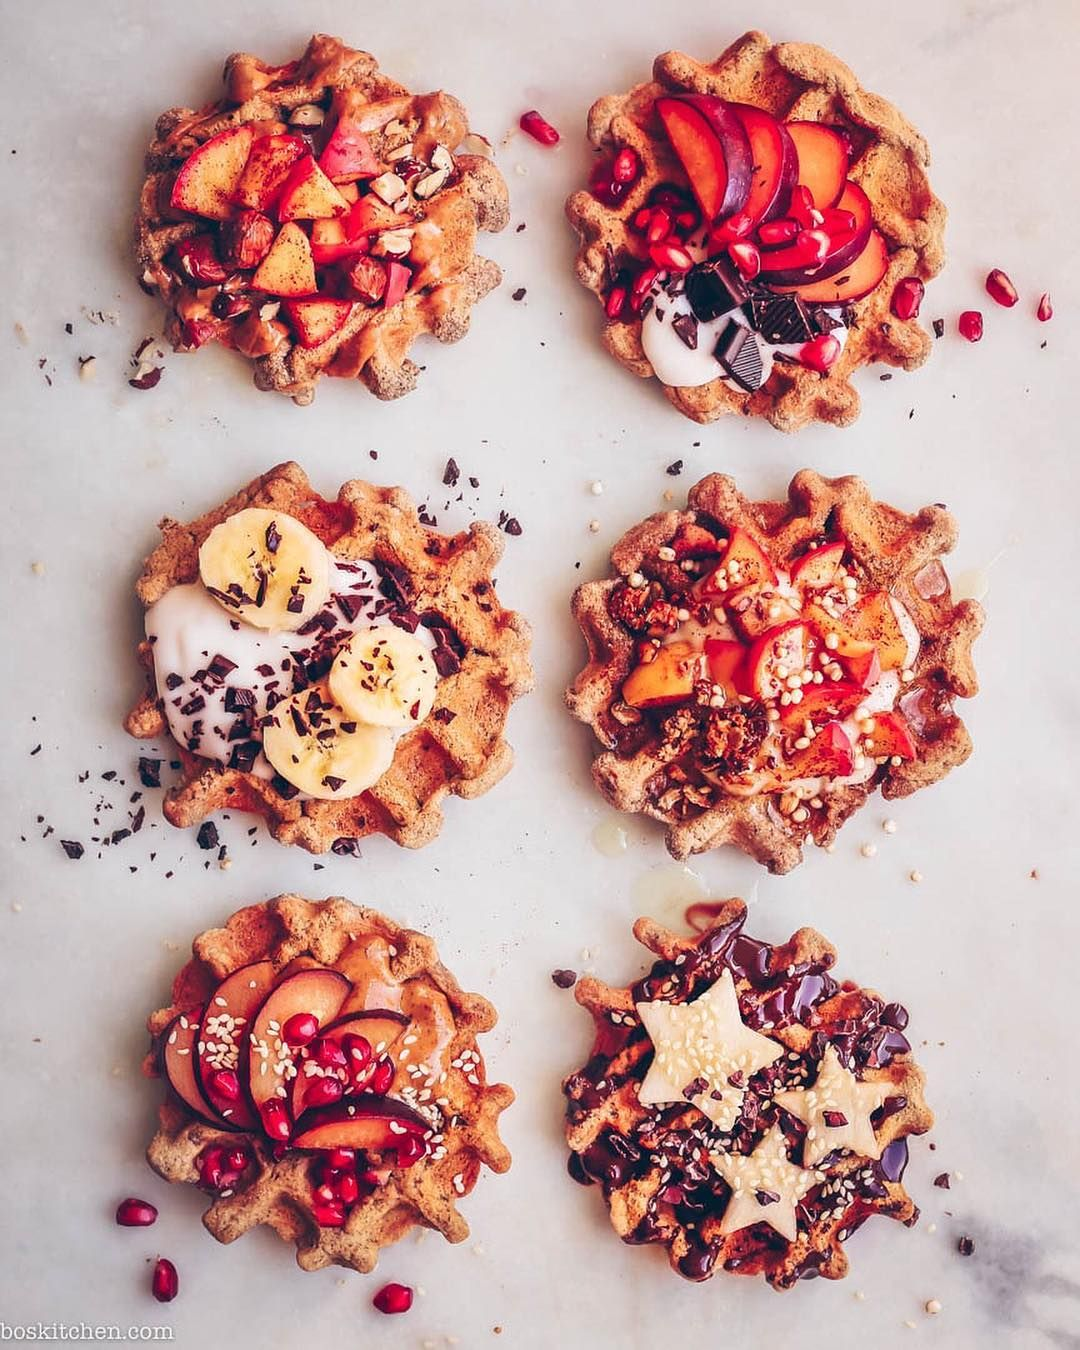 Pumpkin spice waffles 🍁🍂 to start Sunday Almond butter and